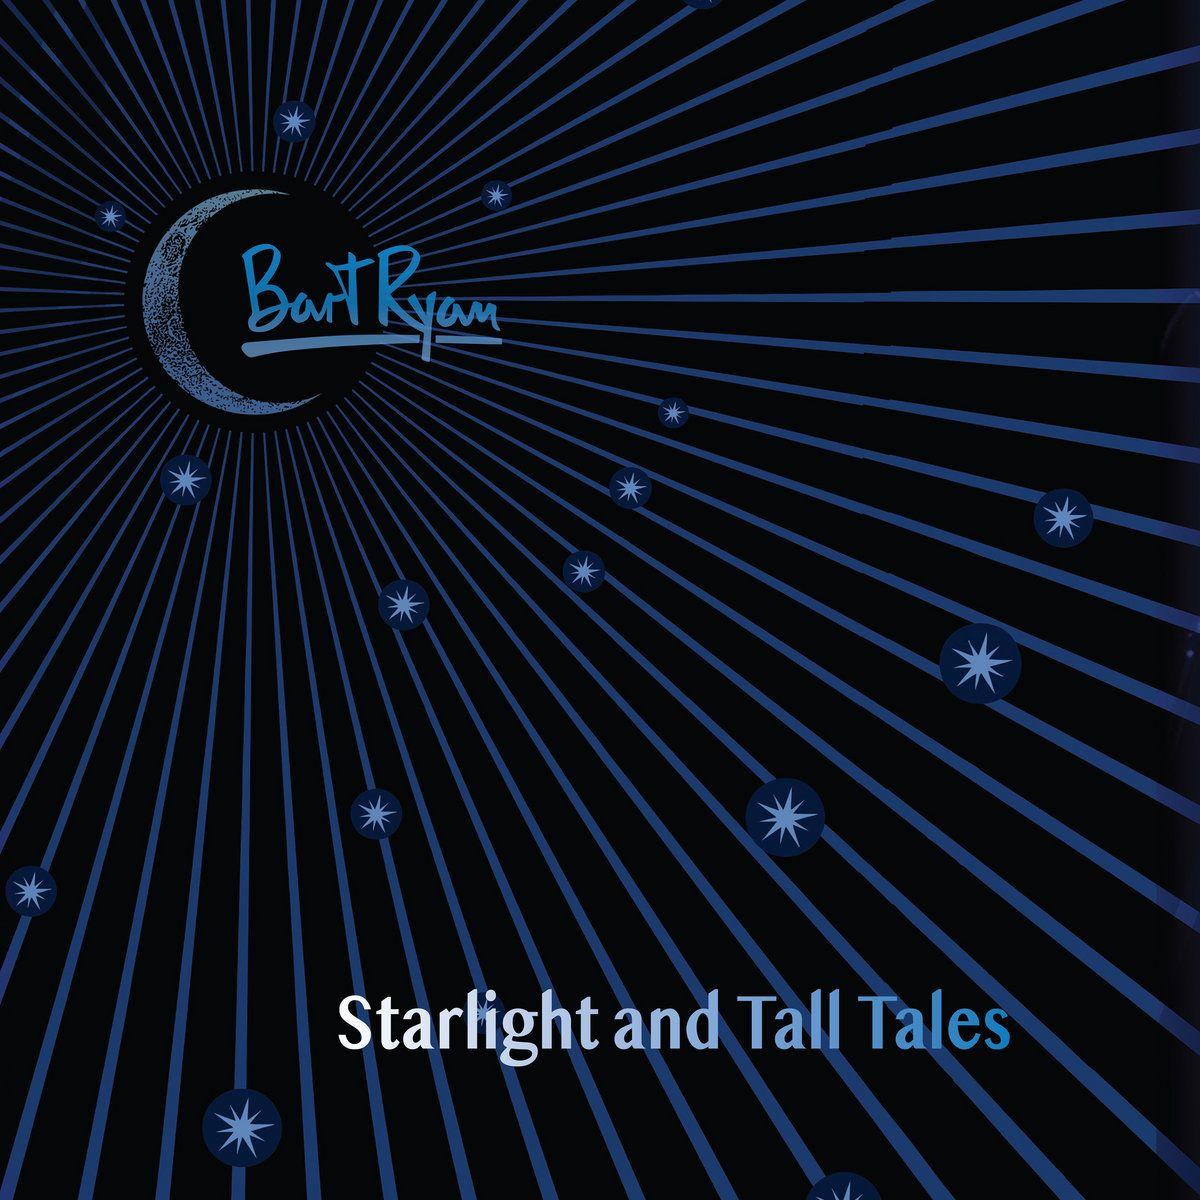 Starlight And Tall Tales